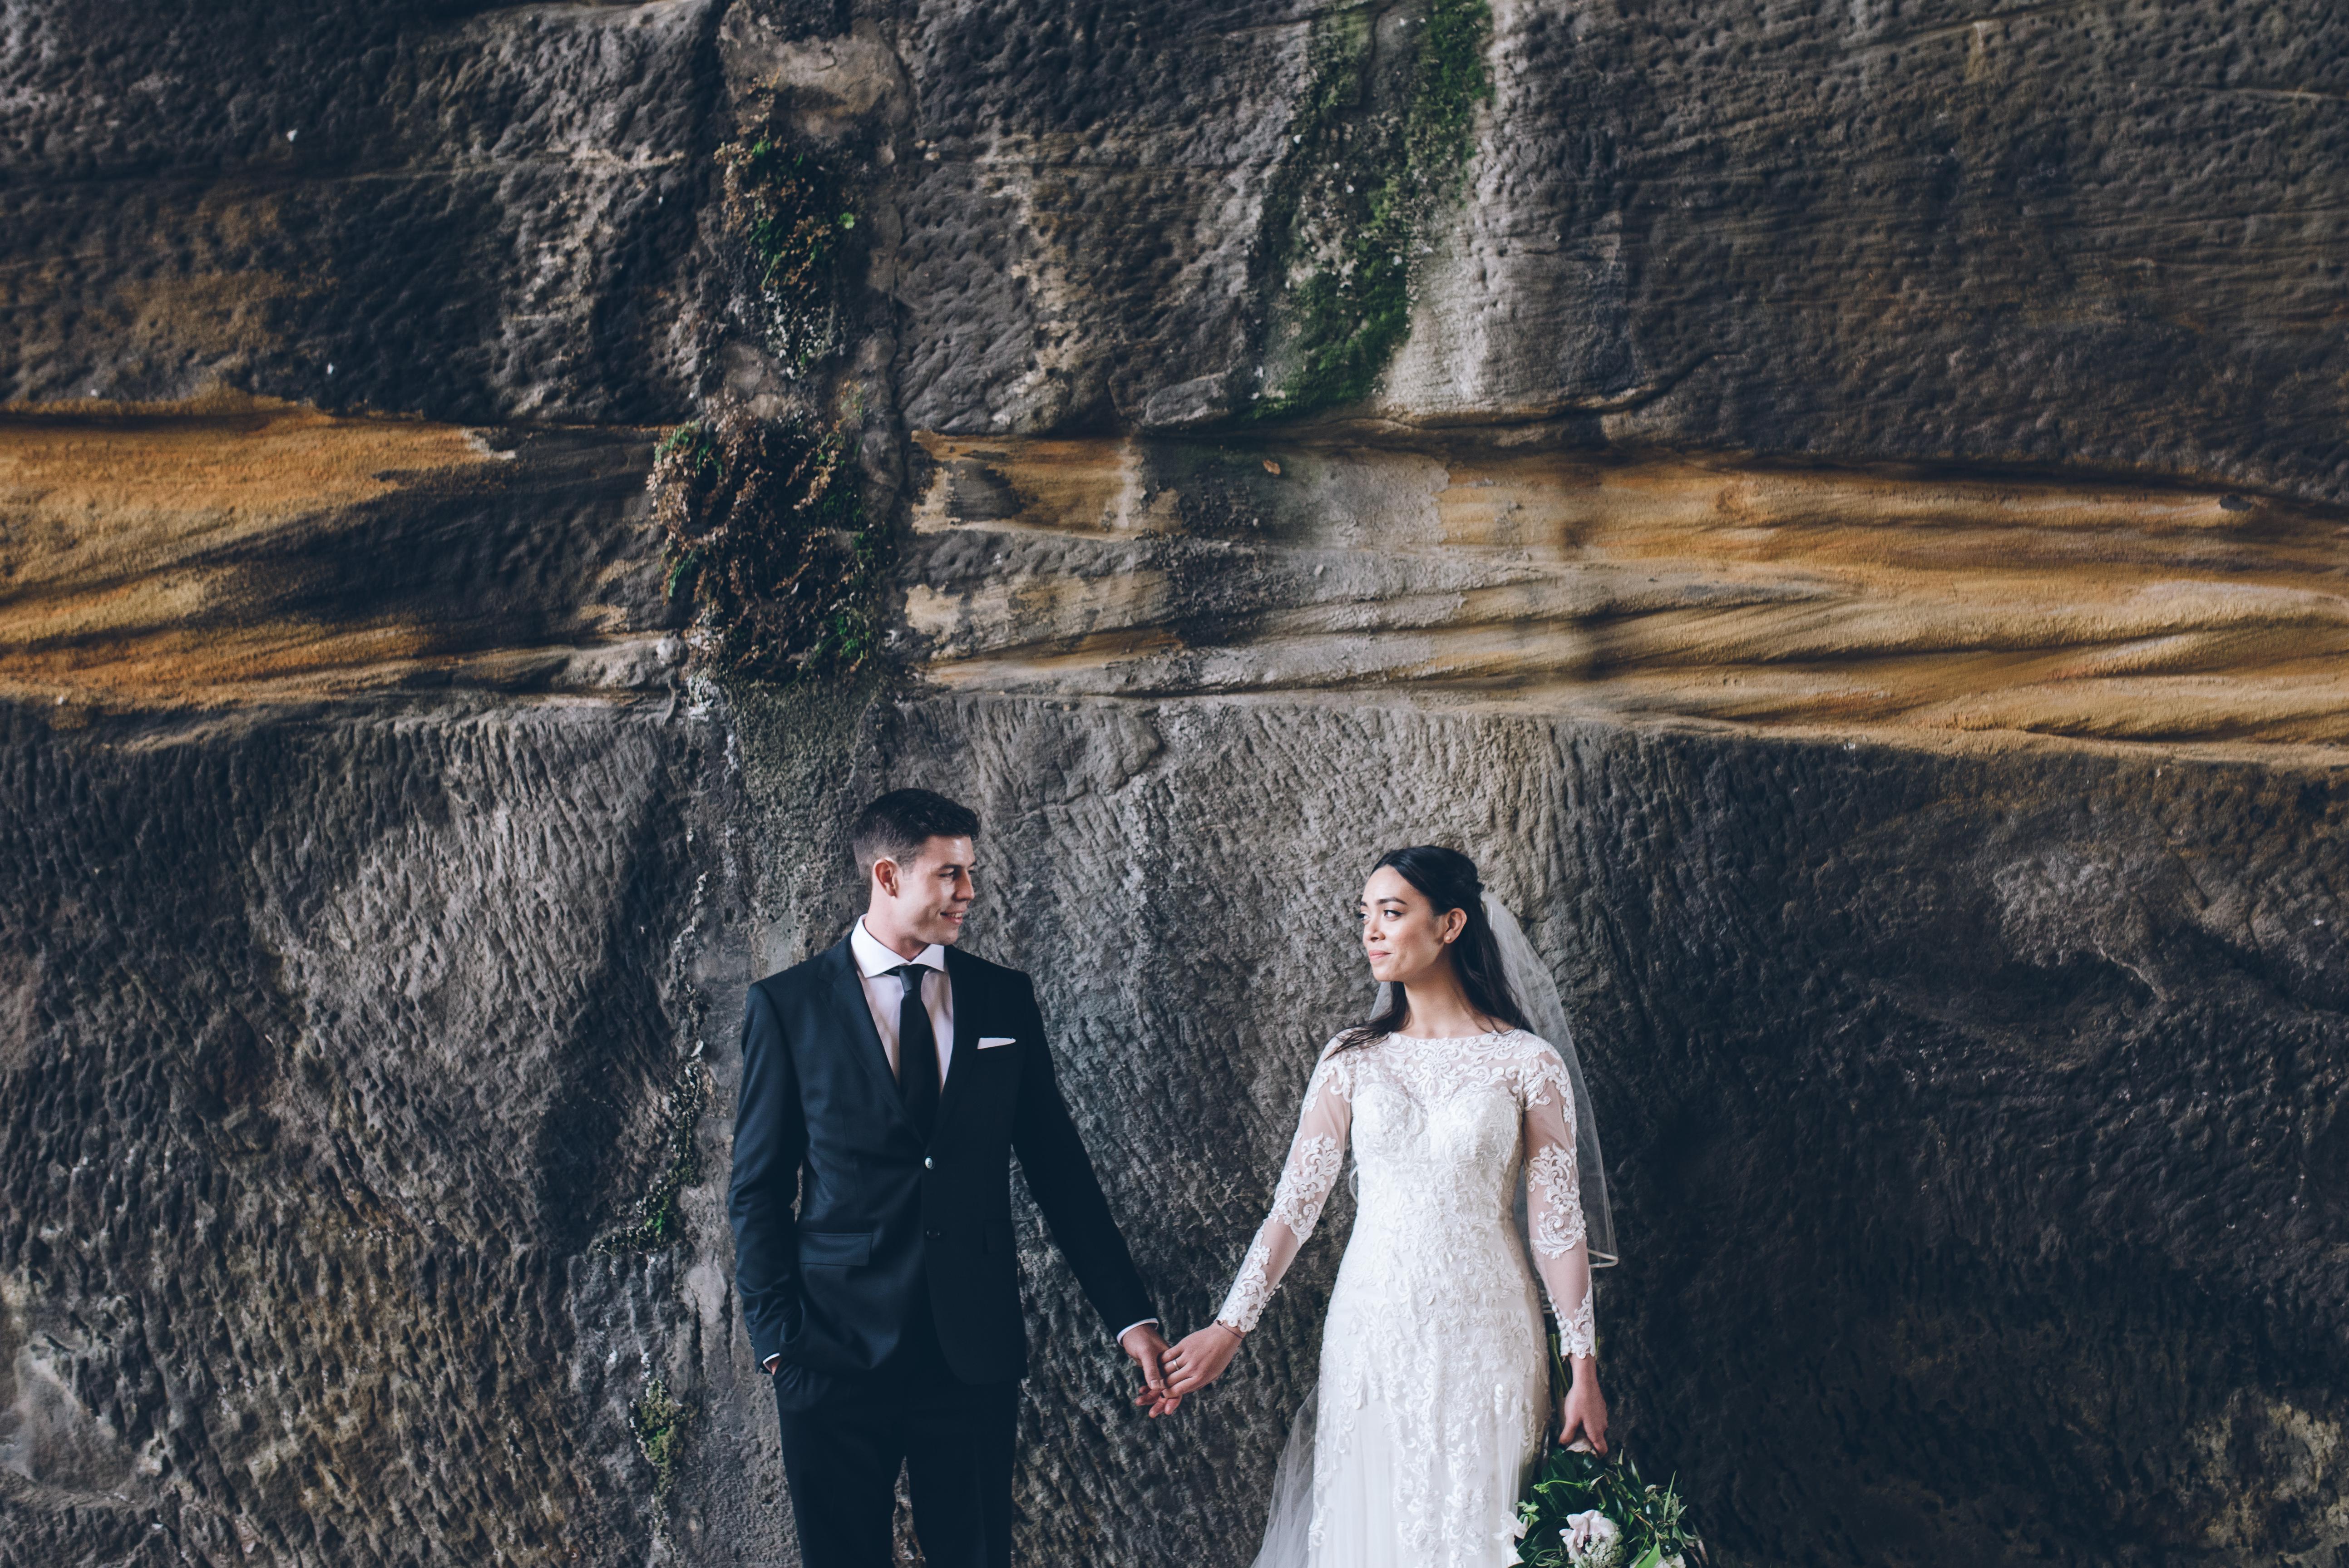 Categories: Weddings-Real Wedding: Janice & Nik - Photography by Jason Corroto